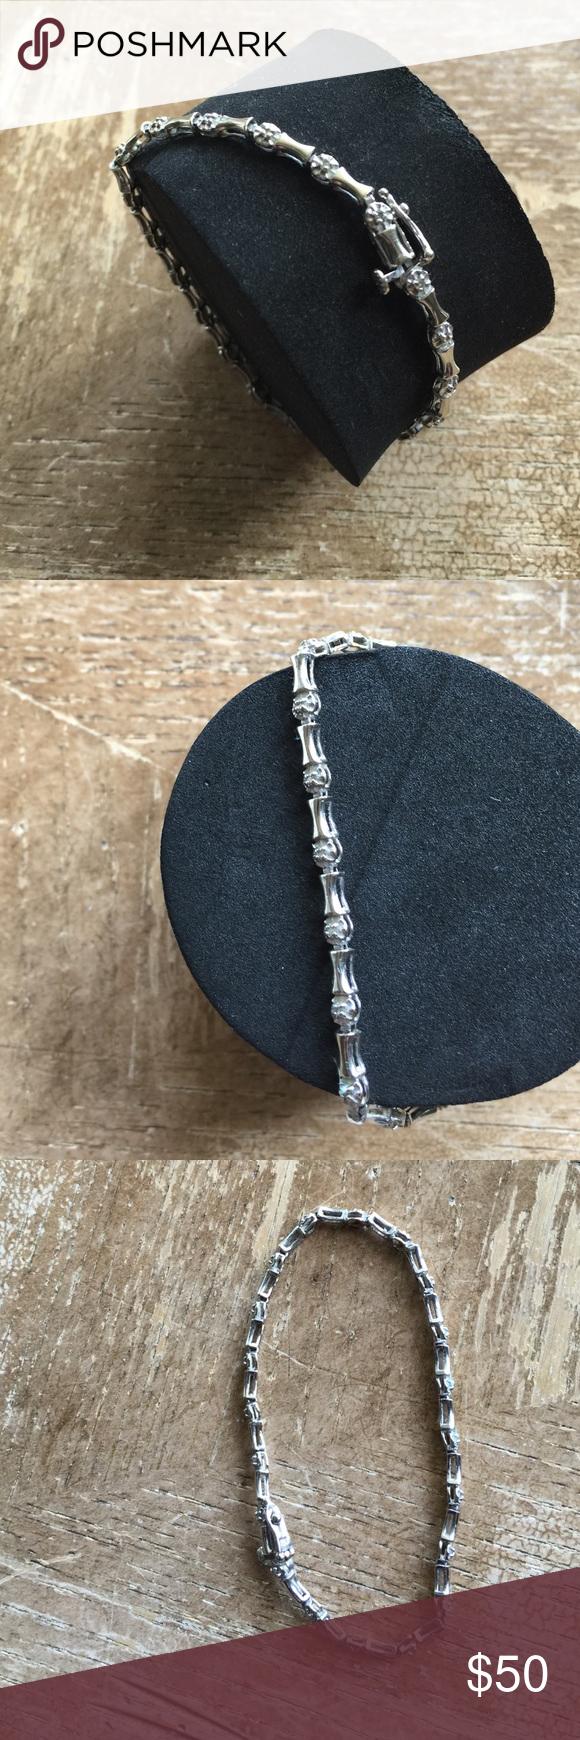 Bracelet 10 K solid  Bracelet 10k solid  Jewelry Bracelets